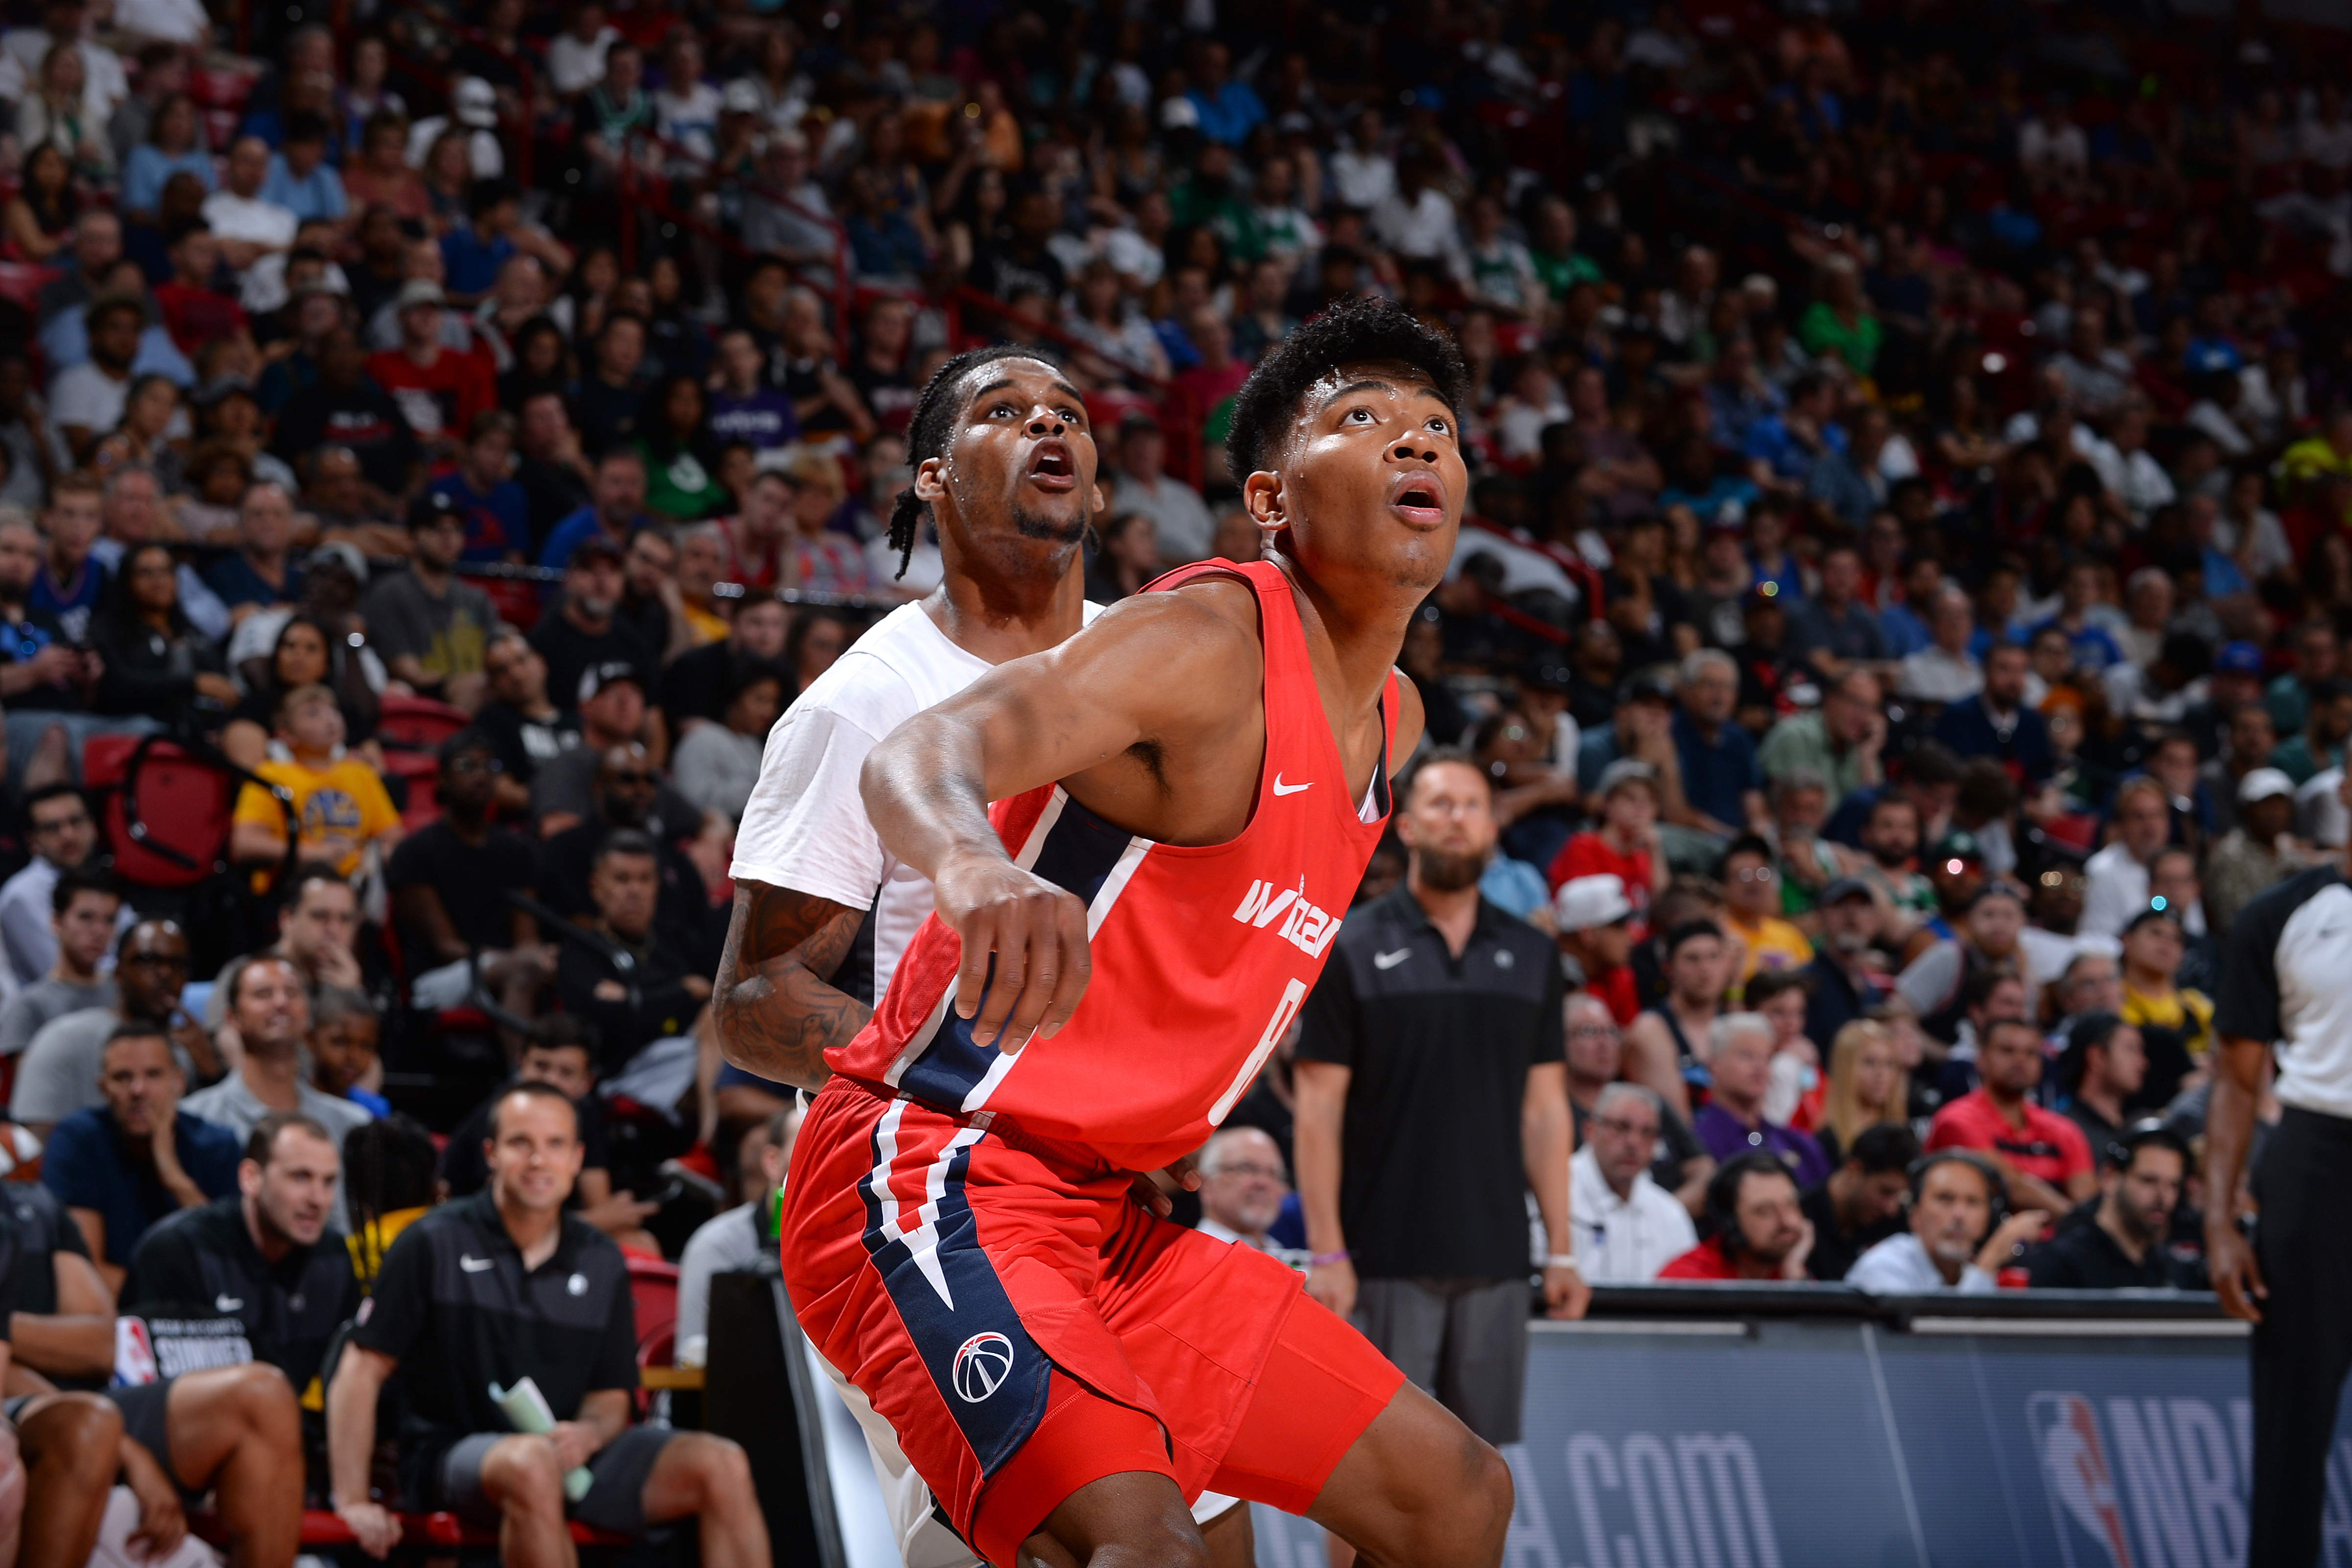 2019 Las Vegas Summer League - Washington Wizards v Brooklyn Nets